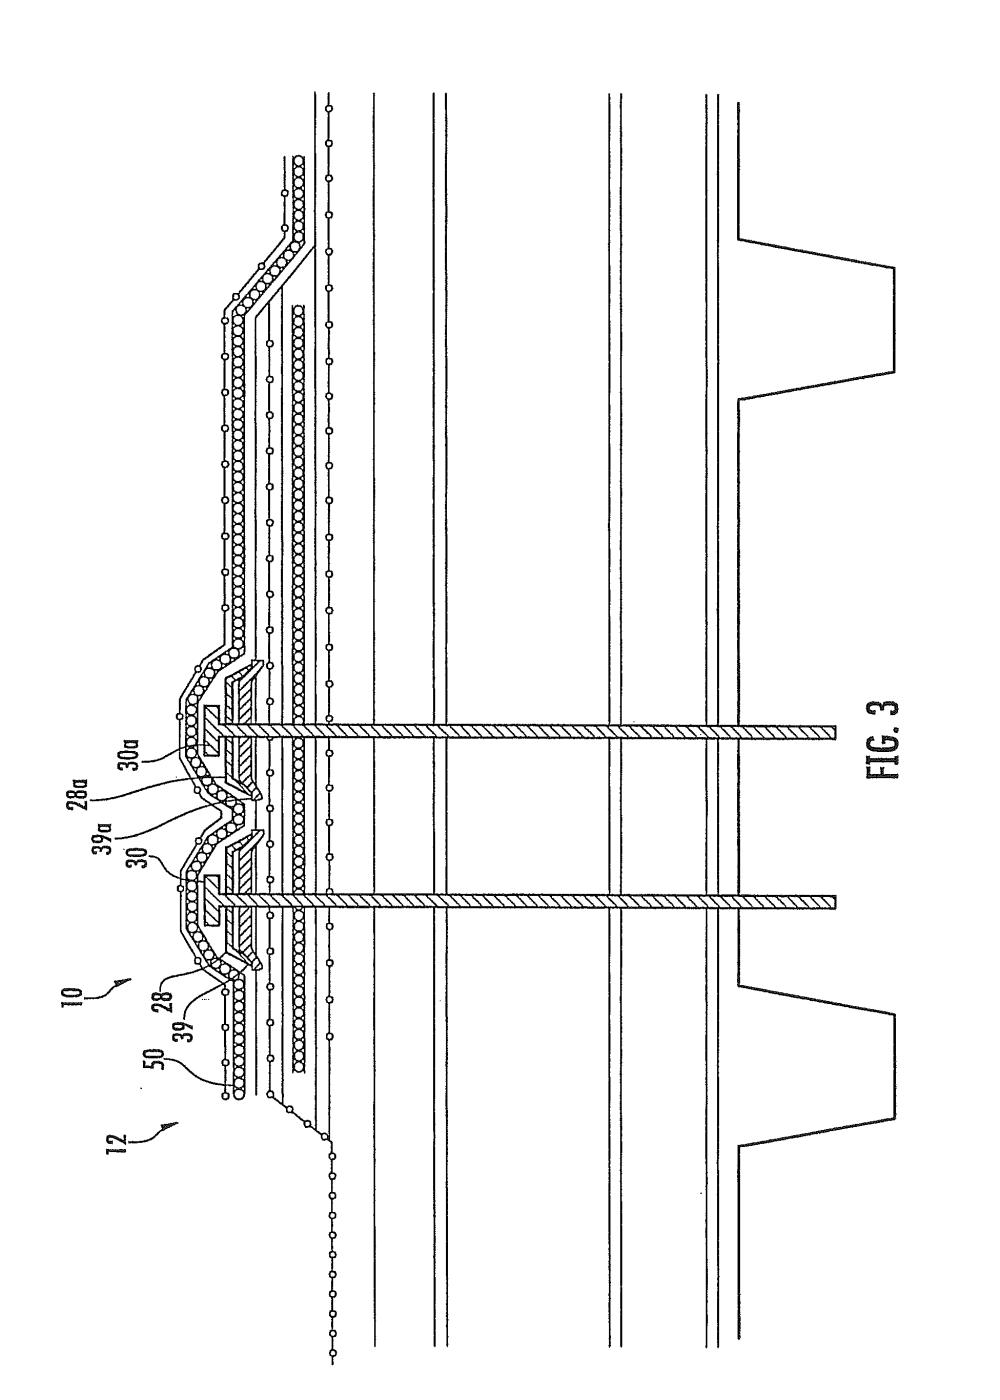 medium resolution of inter systems wiring diagram wiring library inter systems wiring diagram